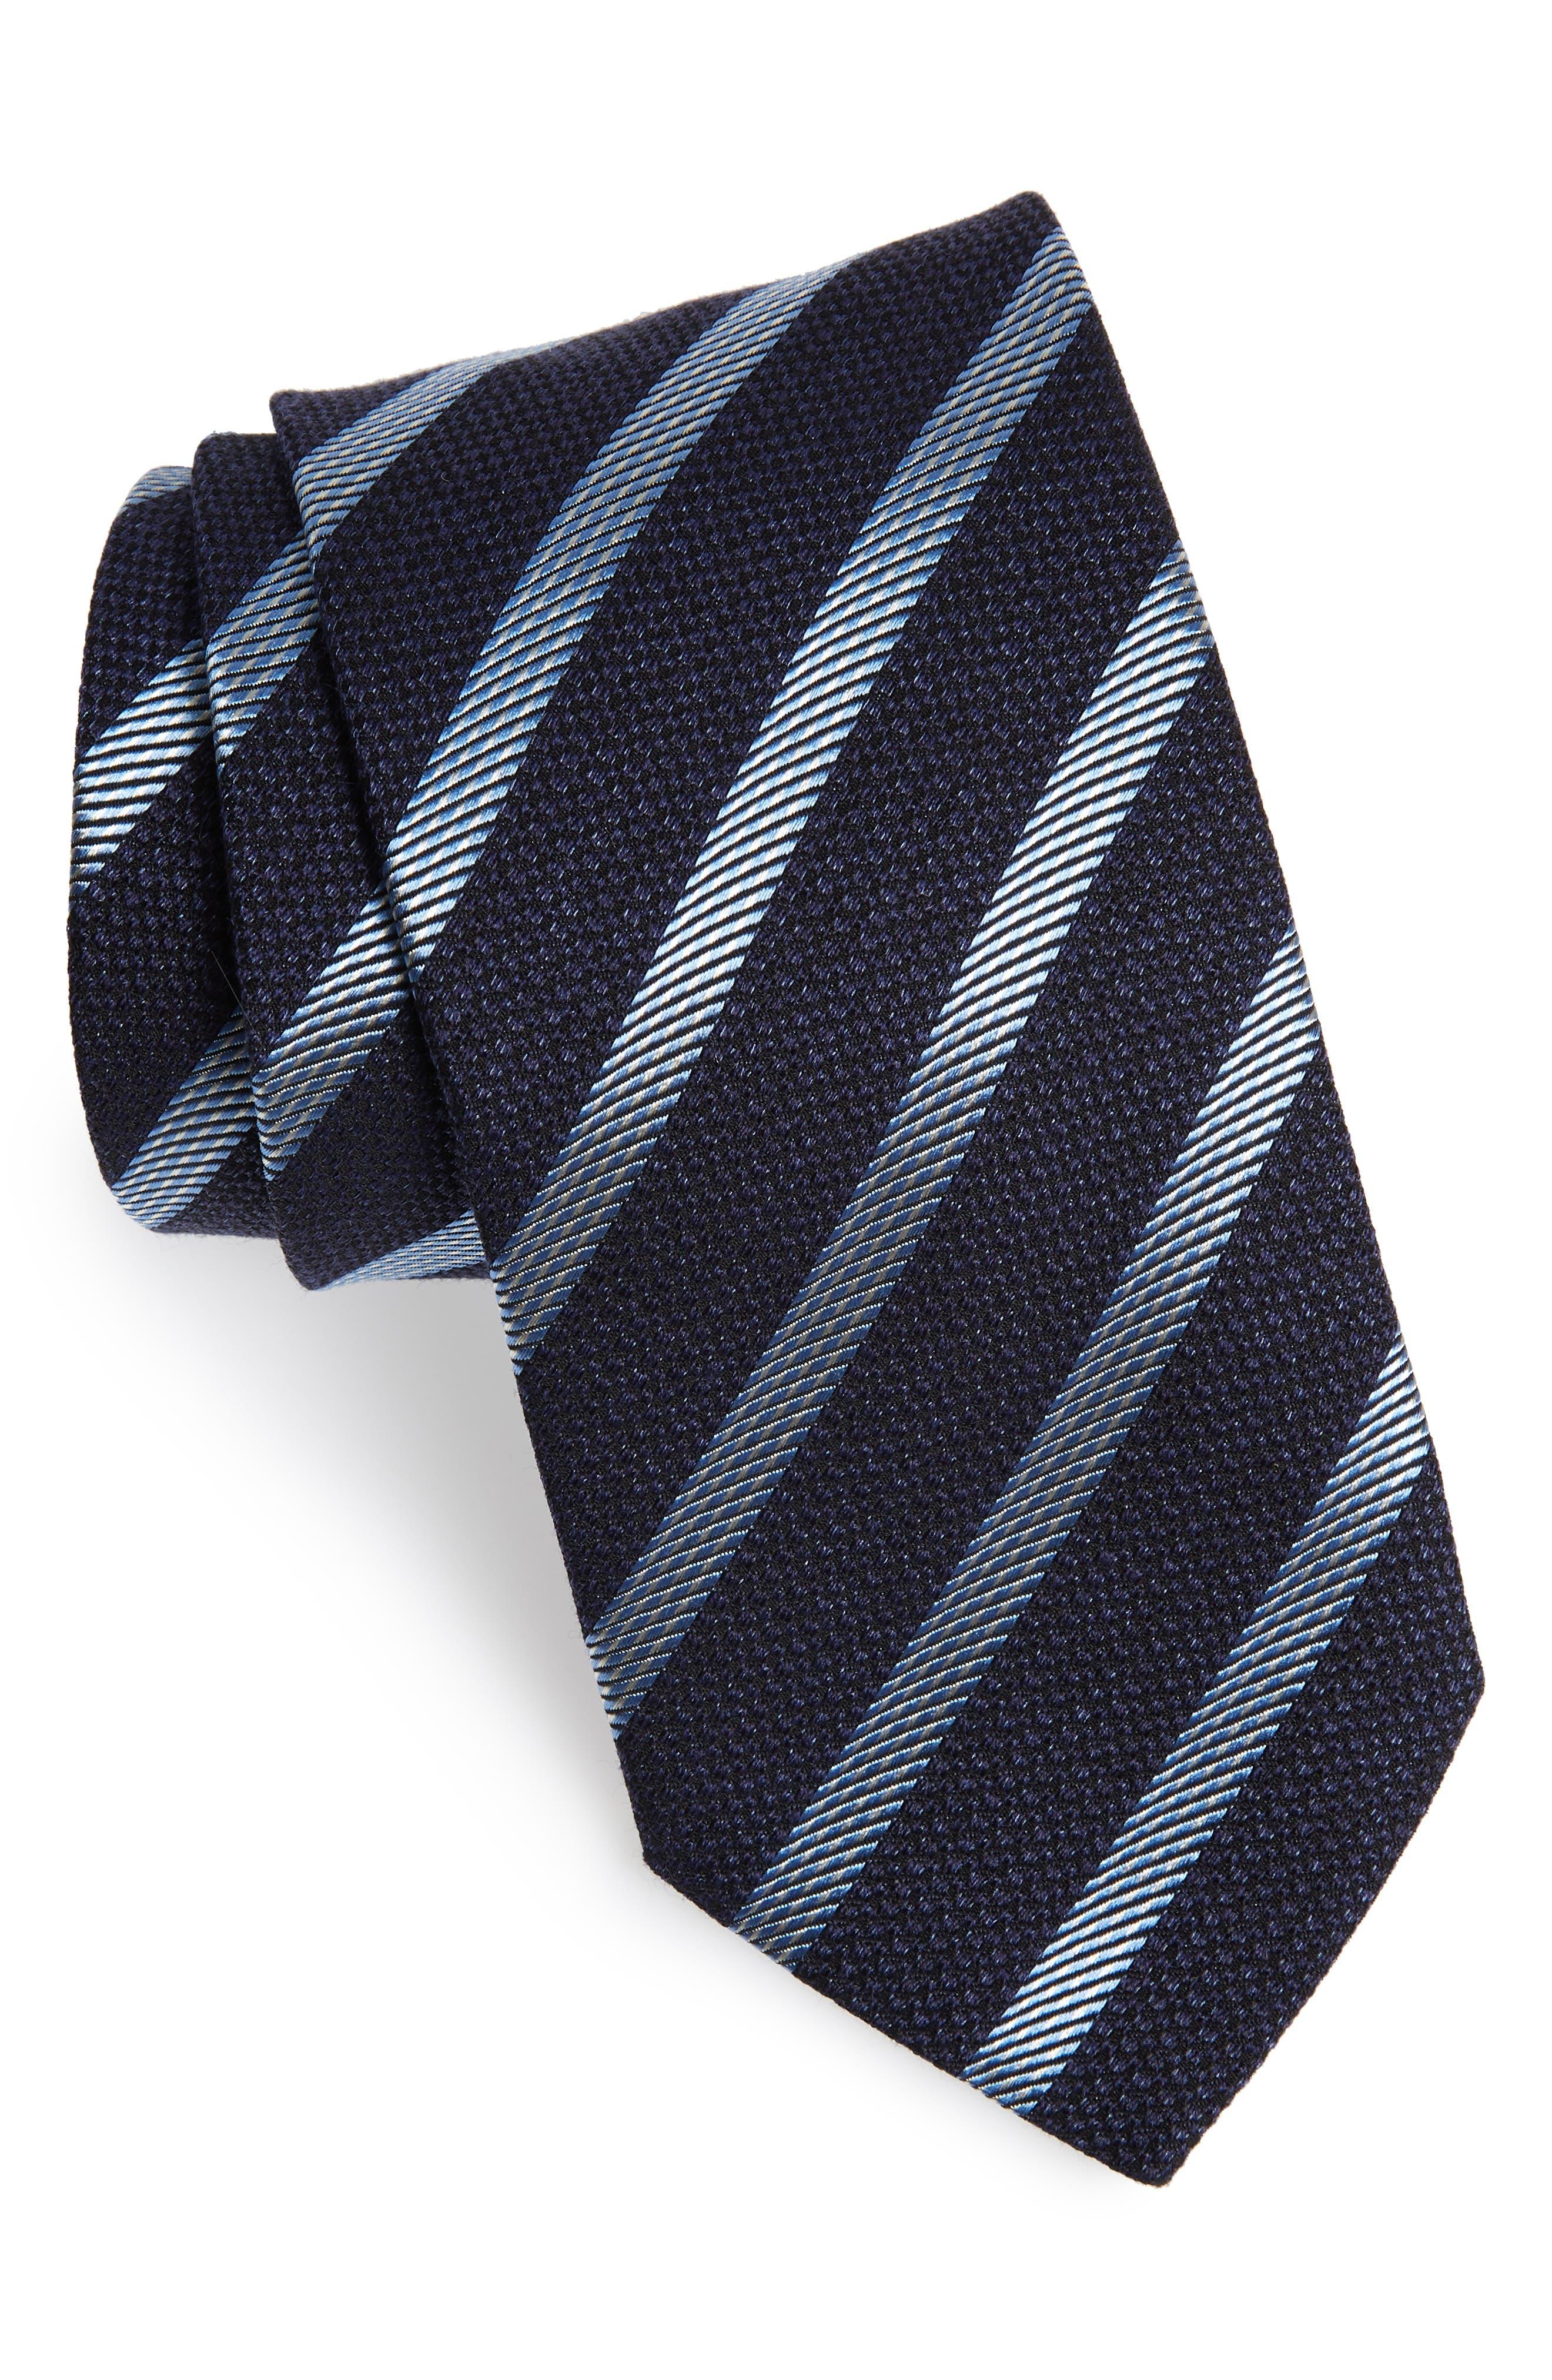 1920s Bow Ties | Gatsby Tie,  Art Deco Tie Mens Eton Stripe Cotton Blend Tie $74.98 AT vintagedancer.com